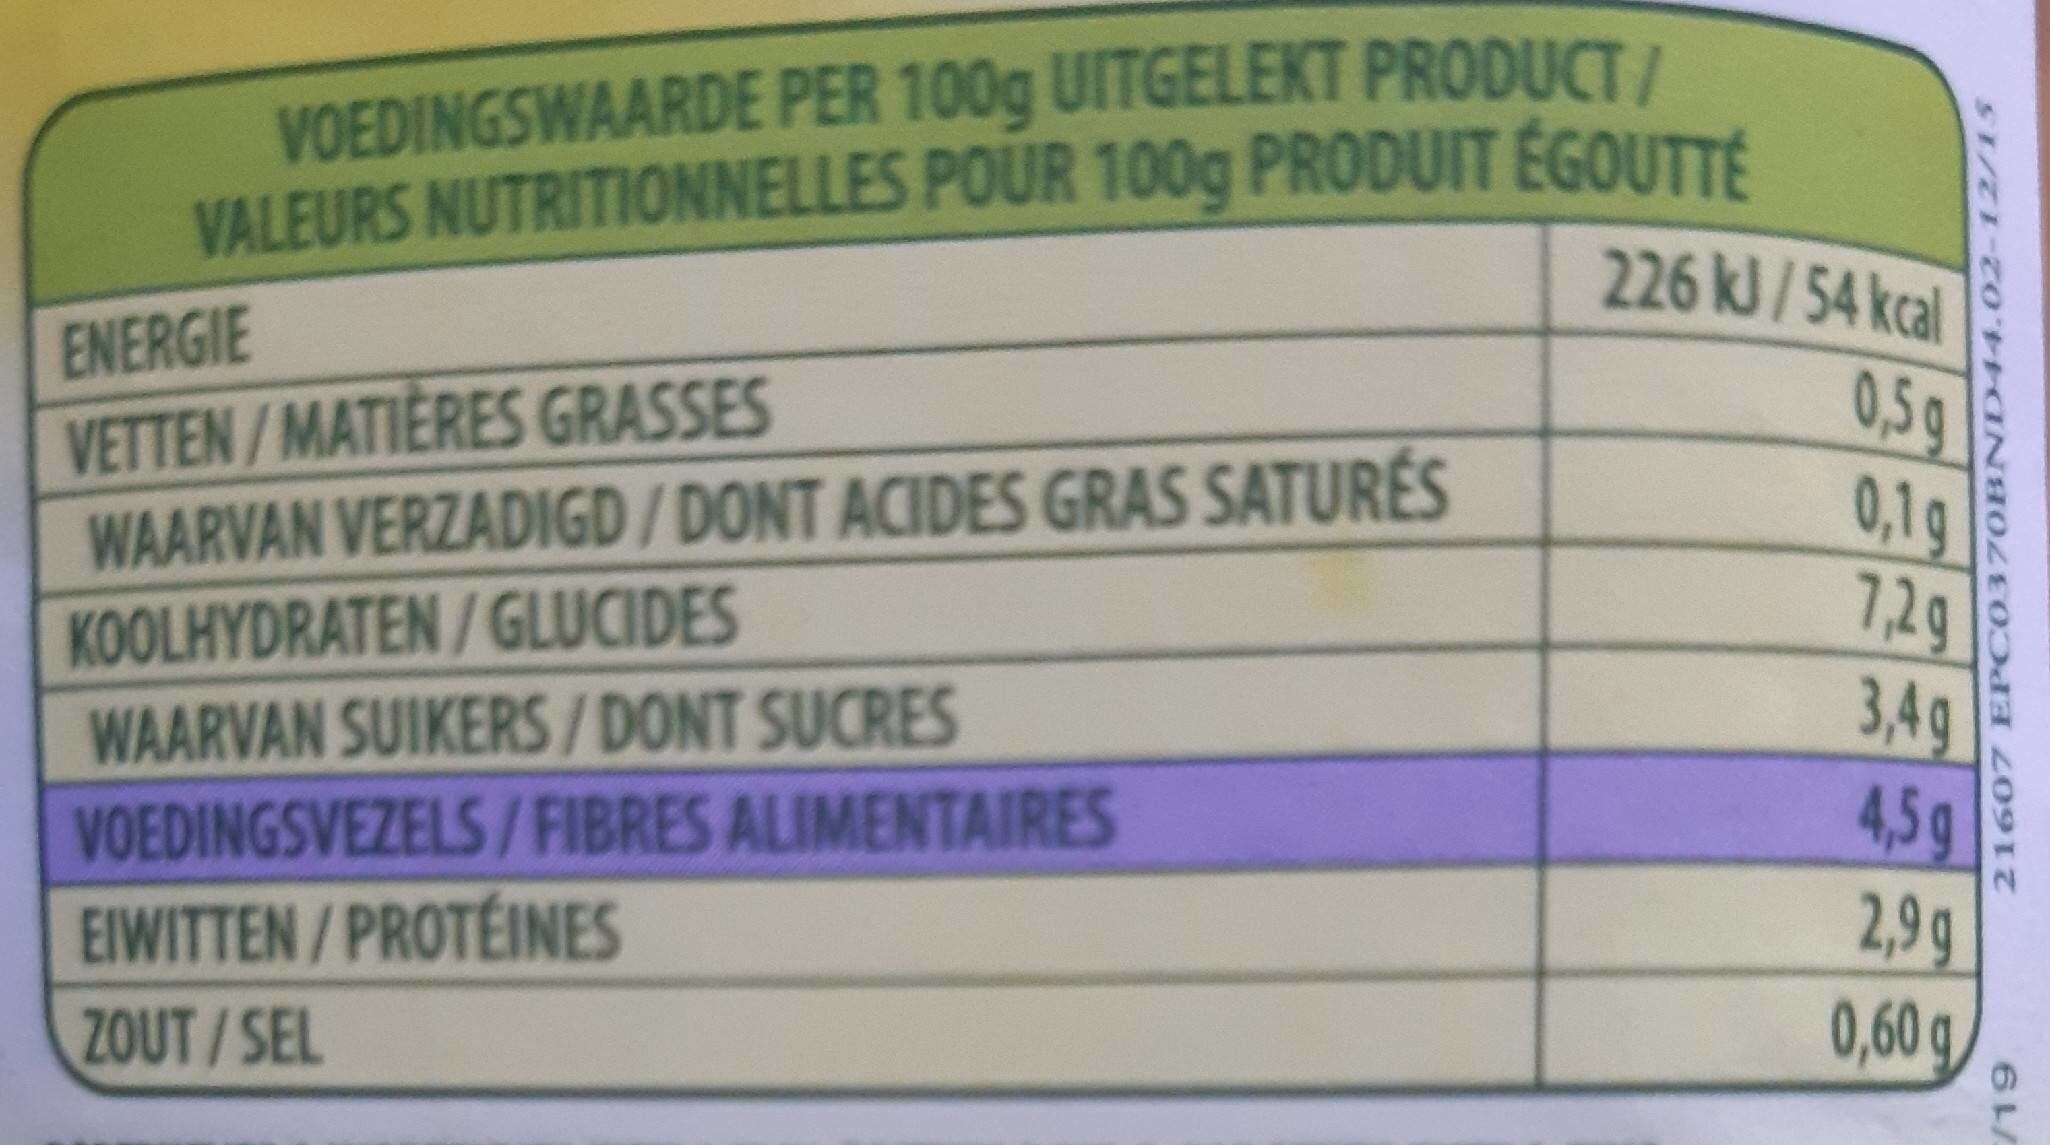 Petits pois et carottes extra fins - Nutrition facts - fr